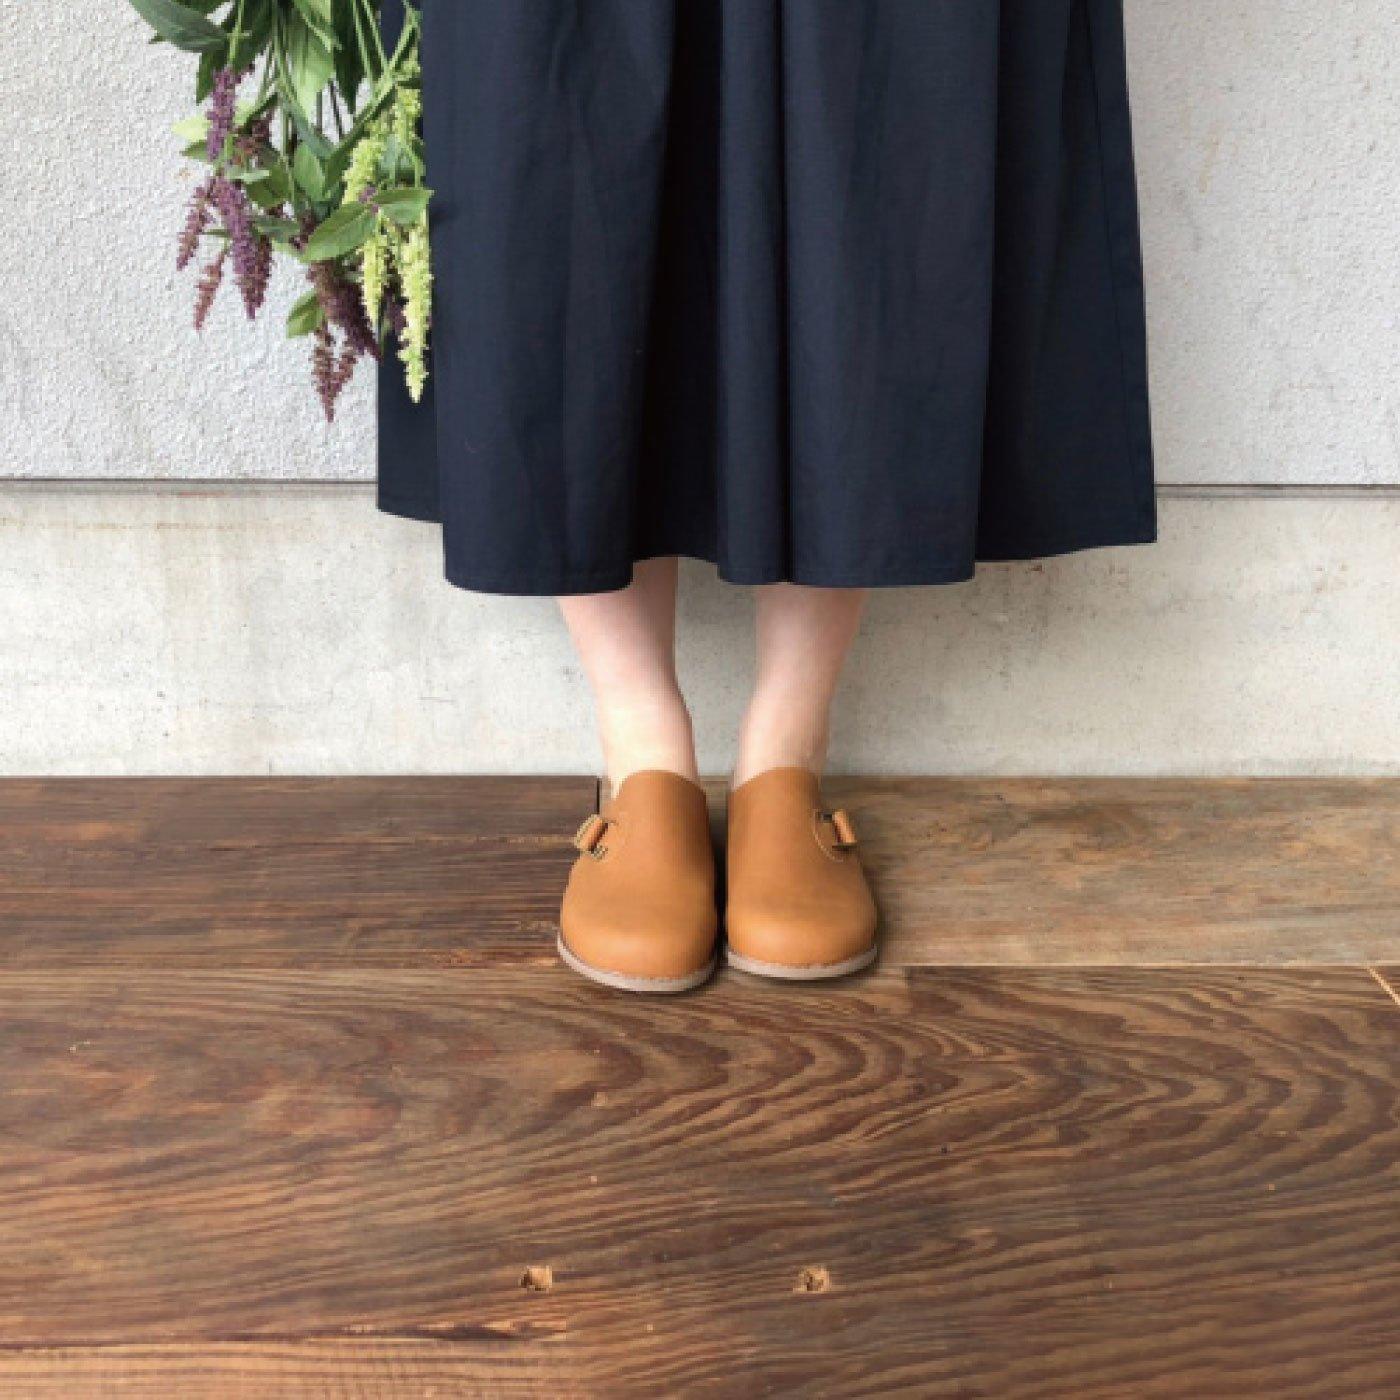 PENNY LANE〔ペニーレイン〕 らくらくすぐ履ける シンプルサボ